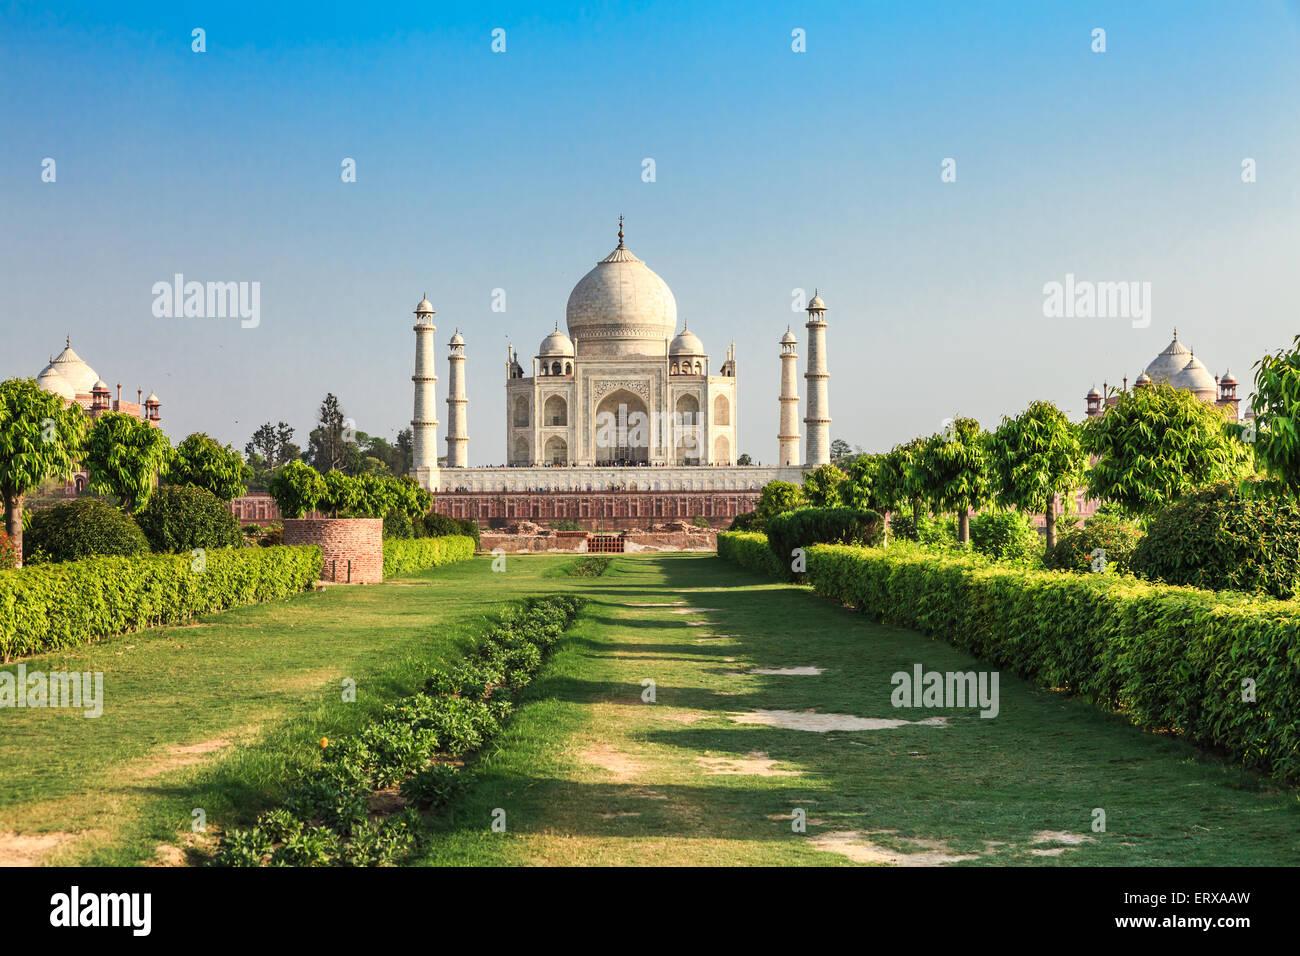 Taj Mahal in the evening, Agra, India - Stock Image